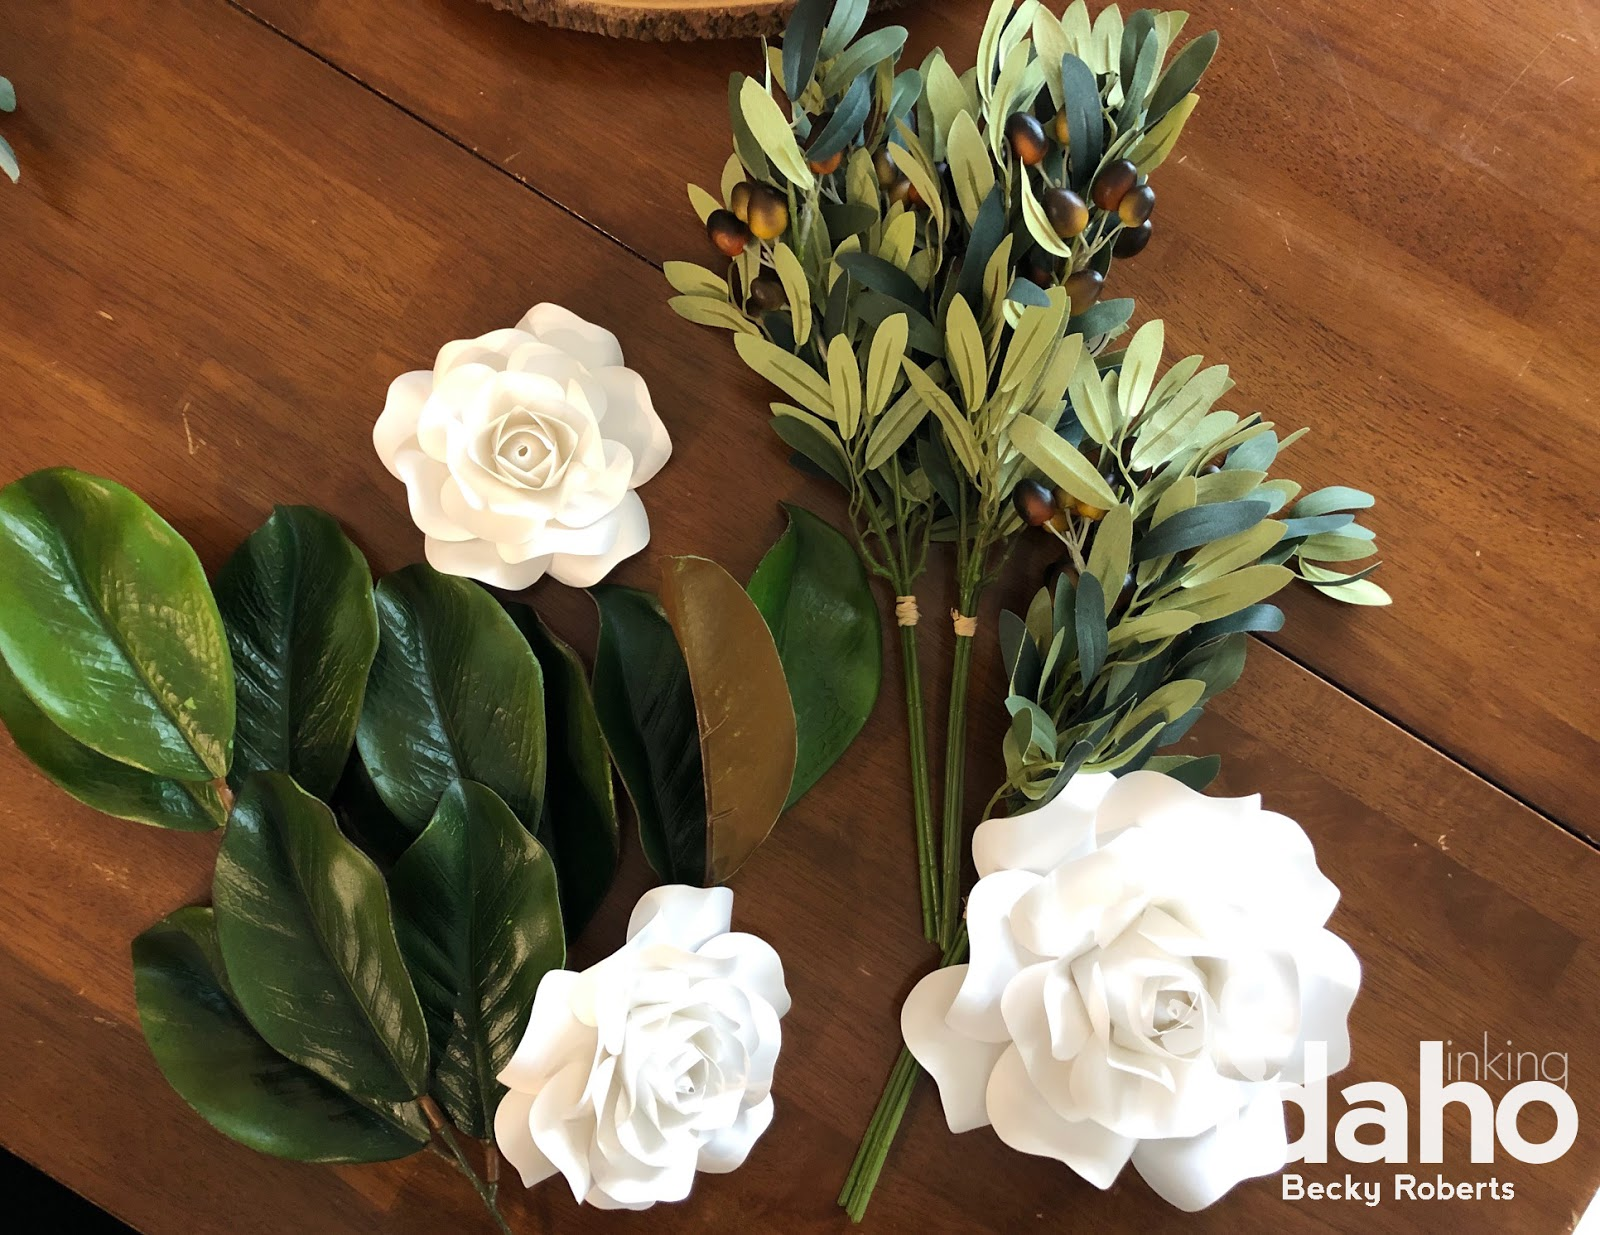 Inking Idaho Paper Flower Farmhouse Eucalyptus Wreath